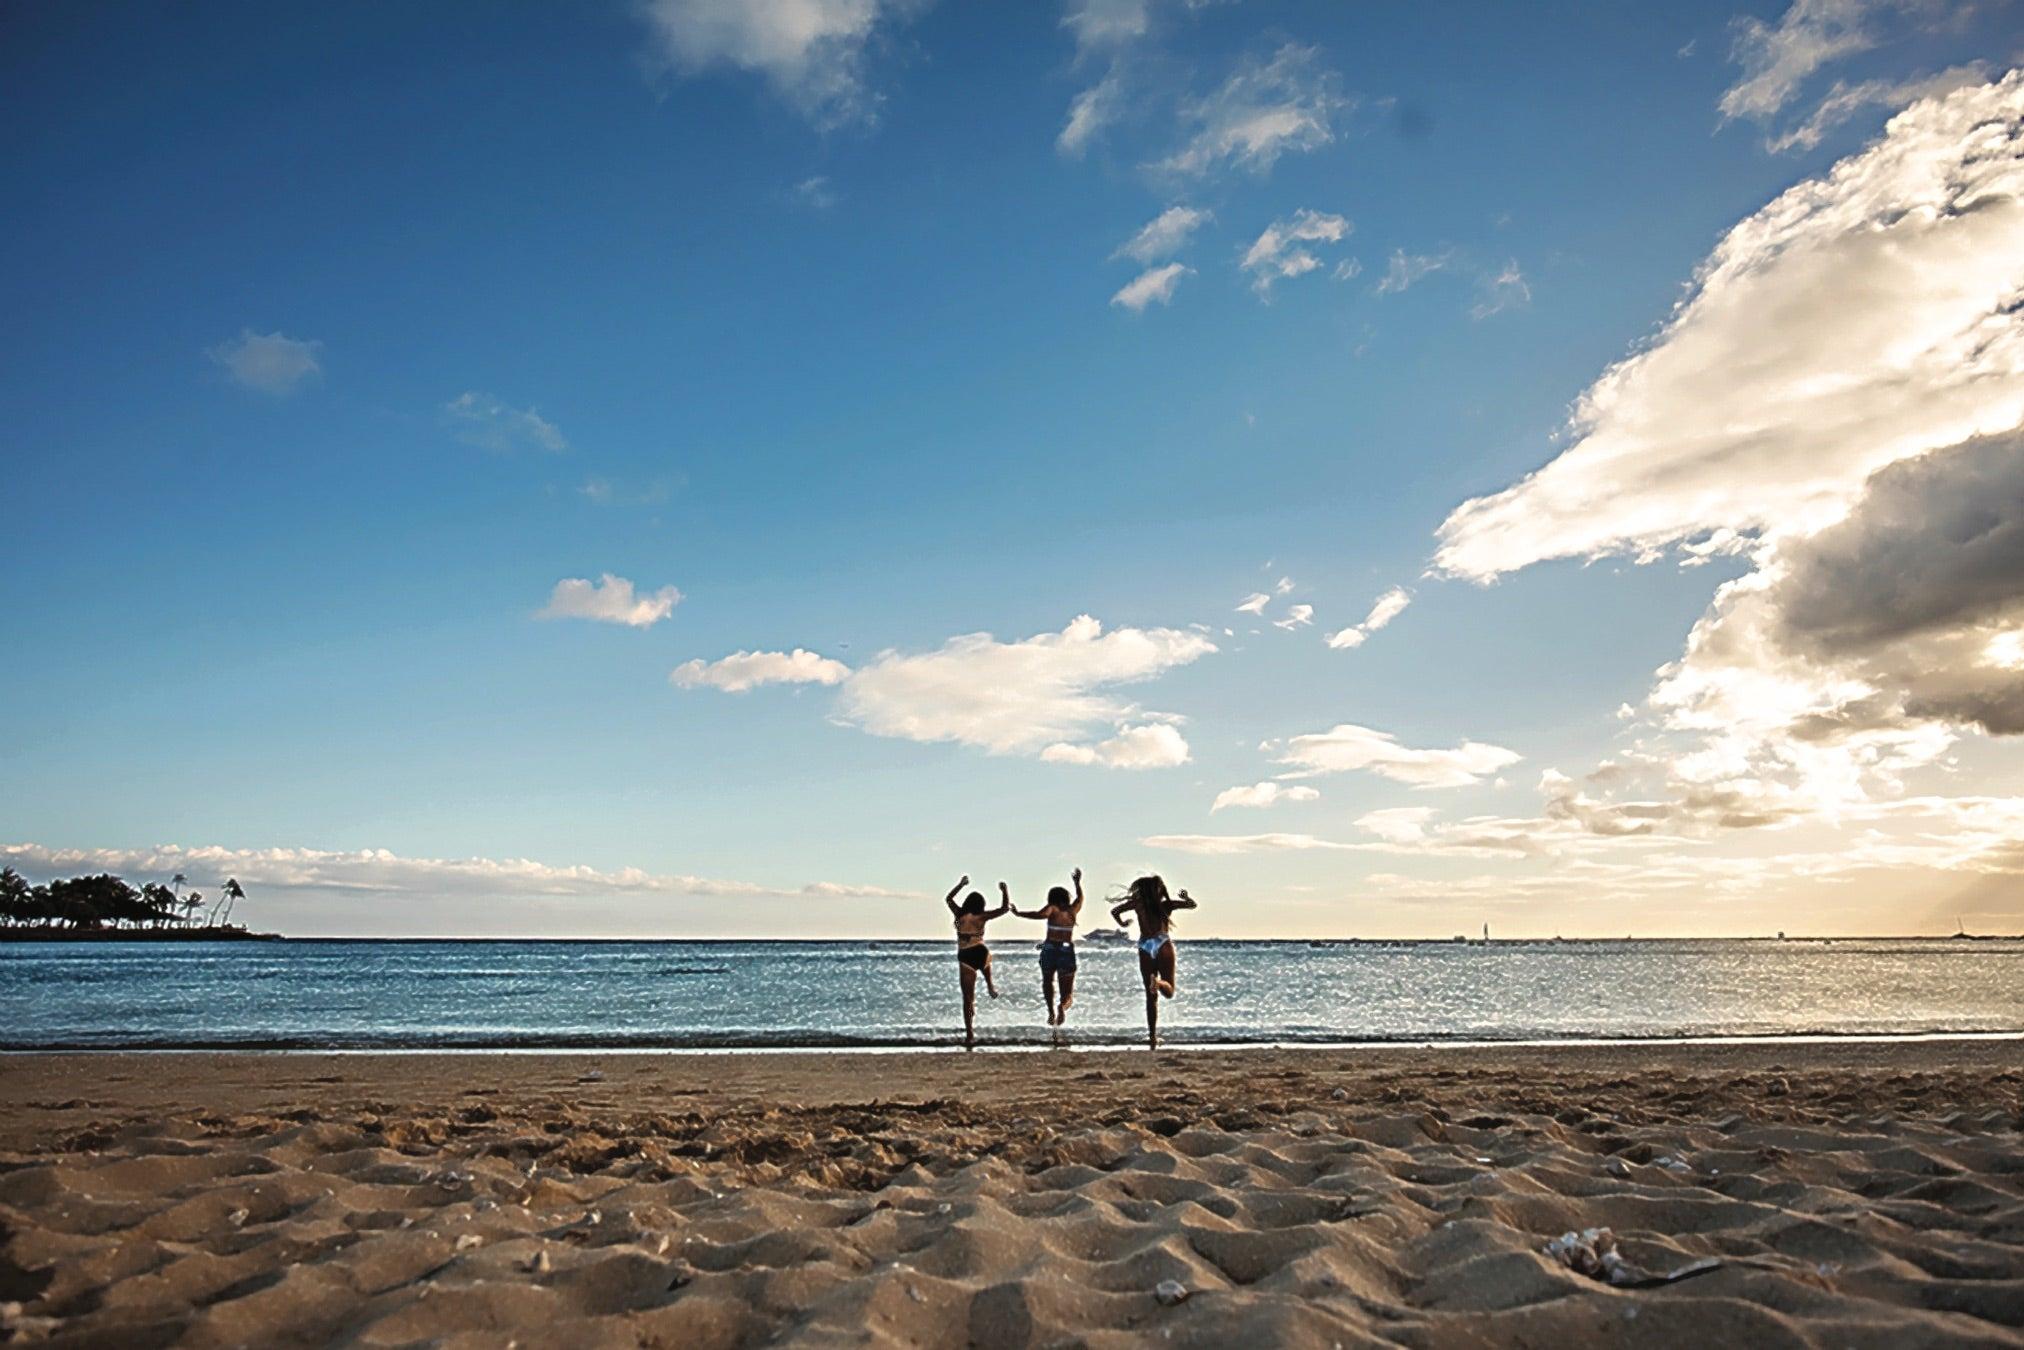 Hit up Ala Moana Beach for some training.